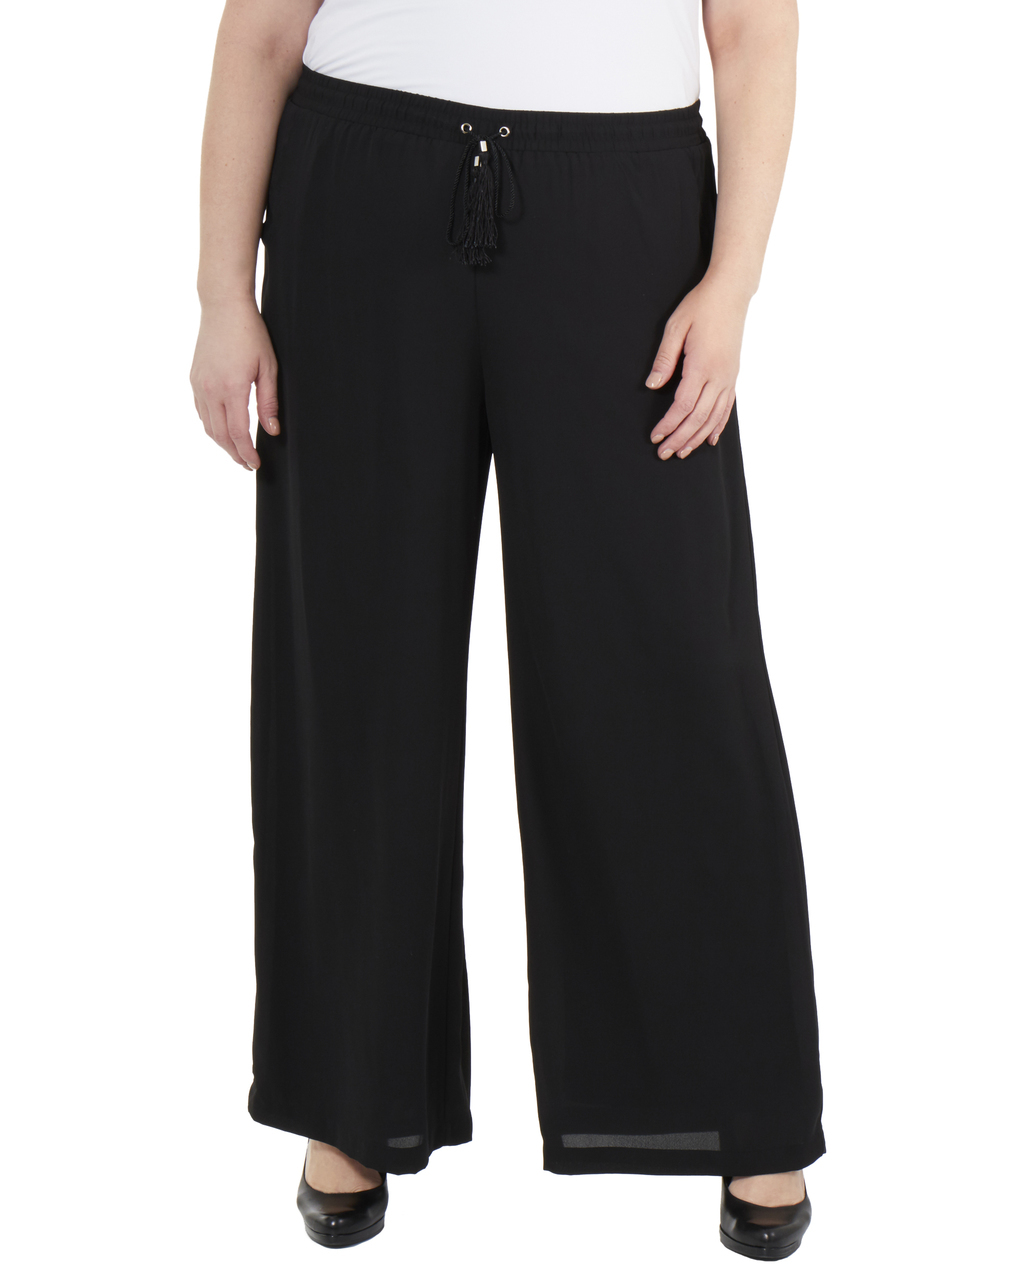 Plus Size Elastic Waist Tassel Tie Palazzo Pants~Black*WDOP0139 ...